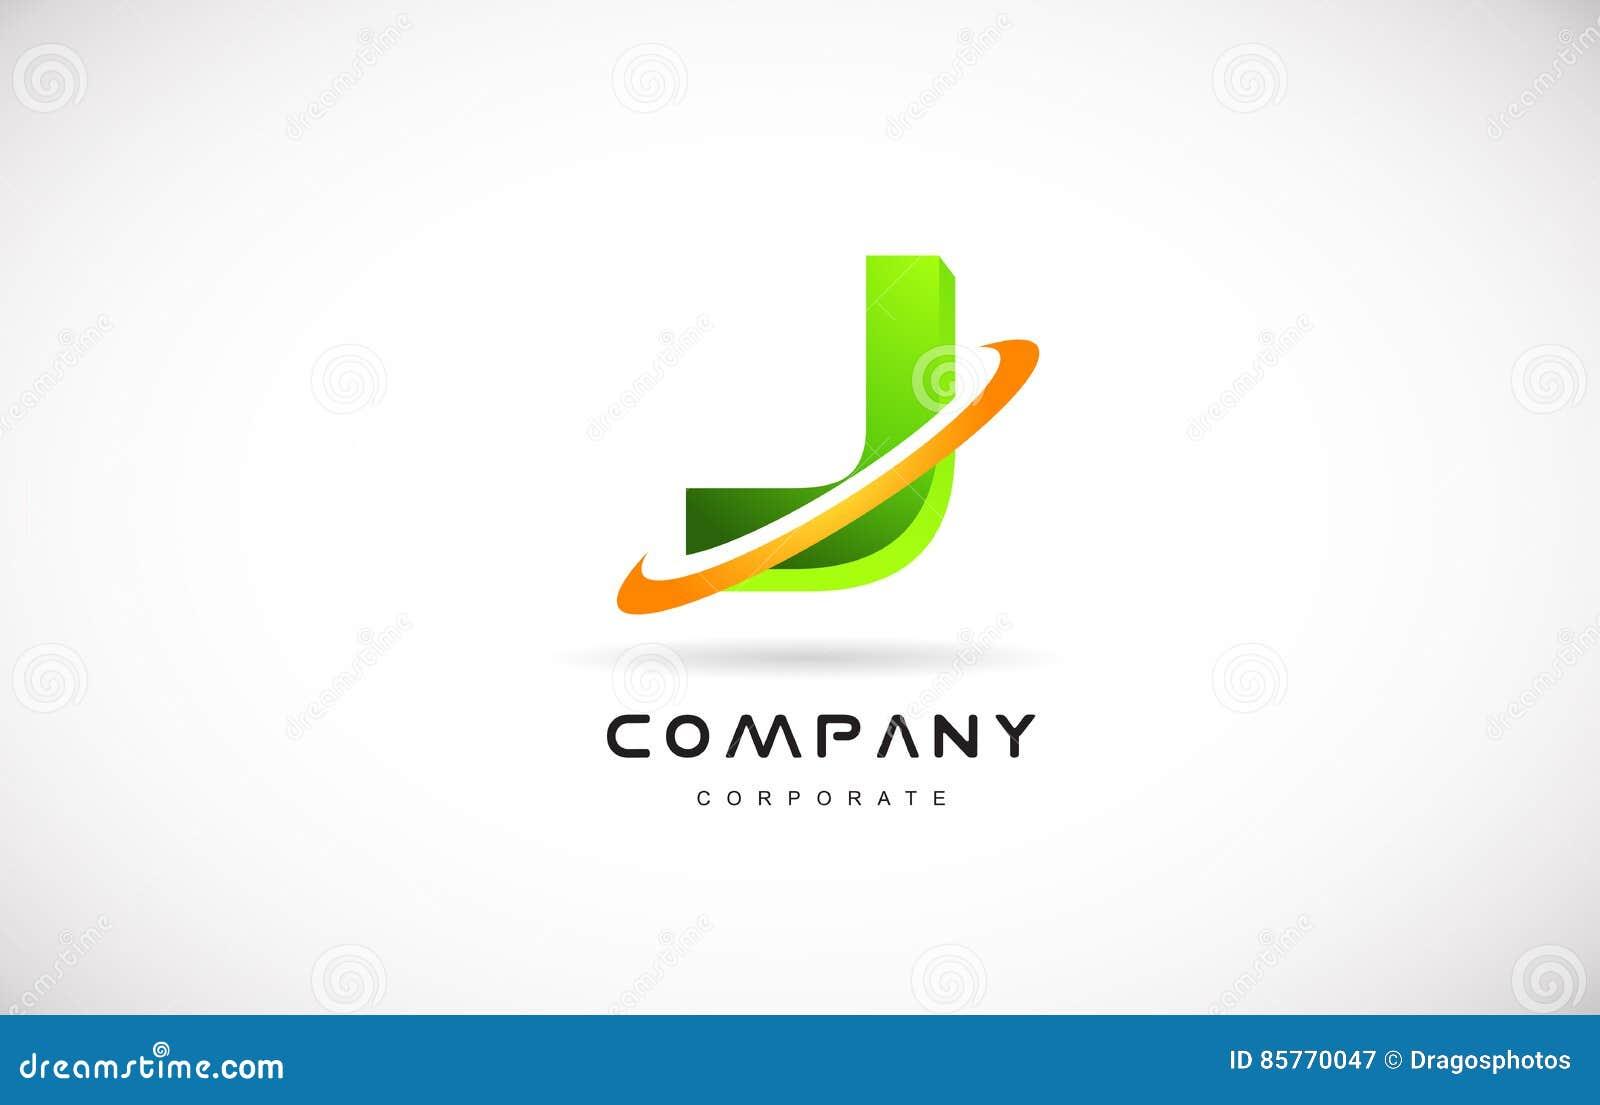 j company logo green letter alphabet 3d design template